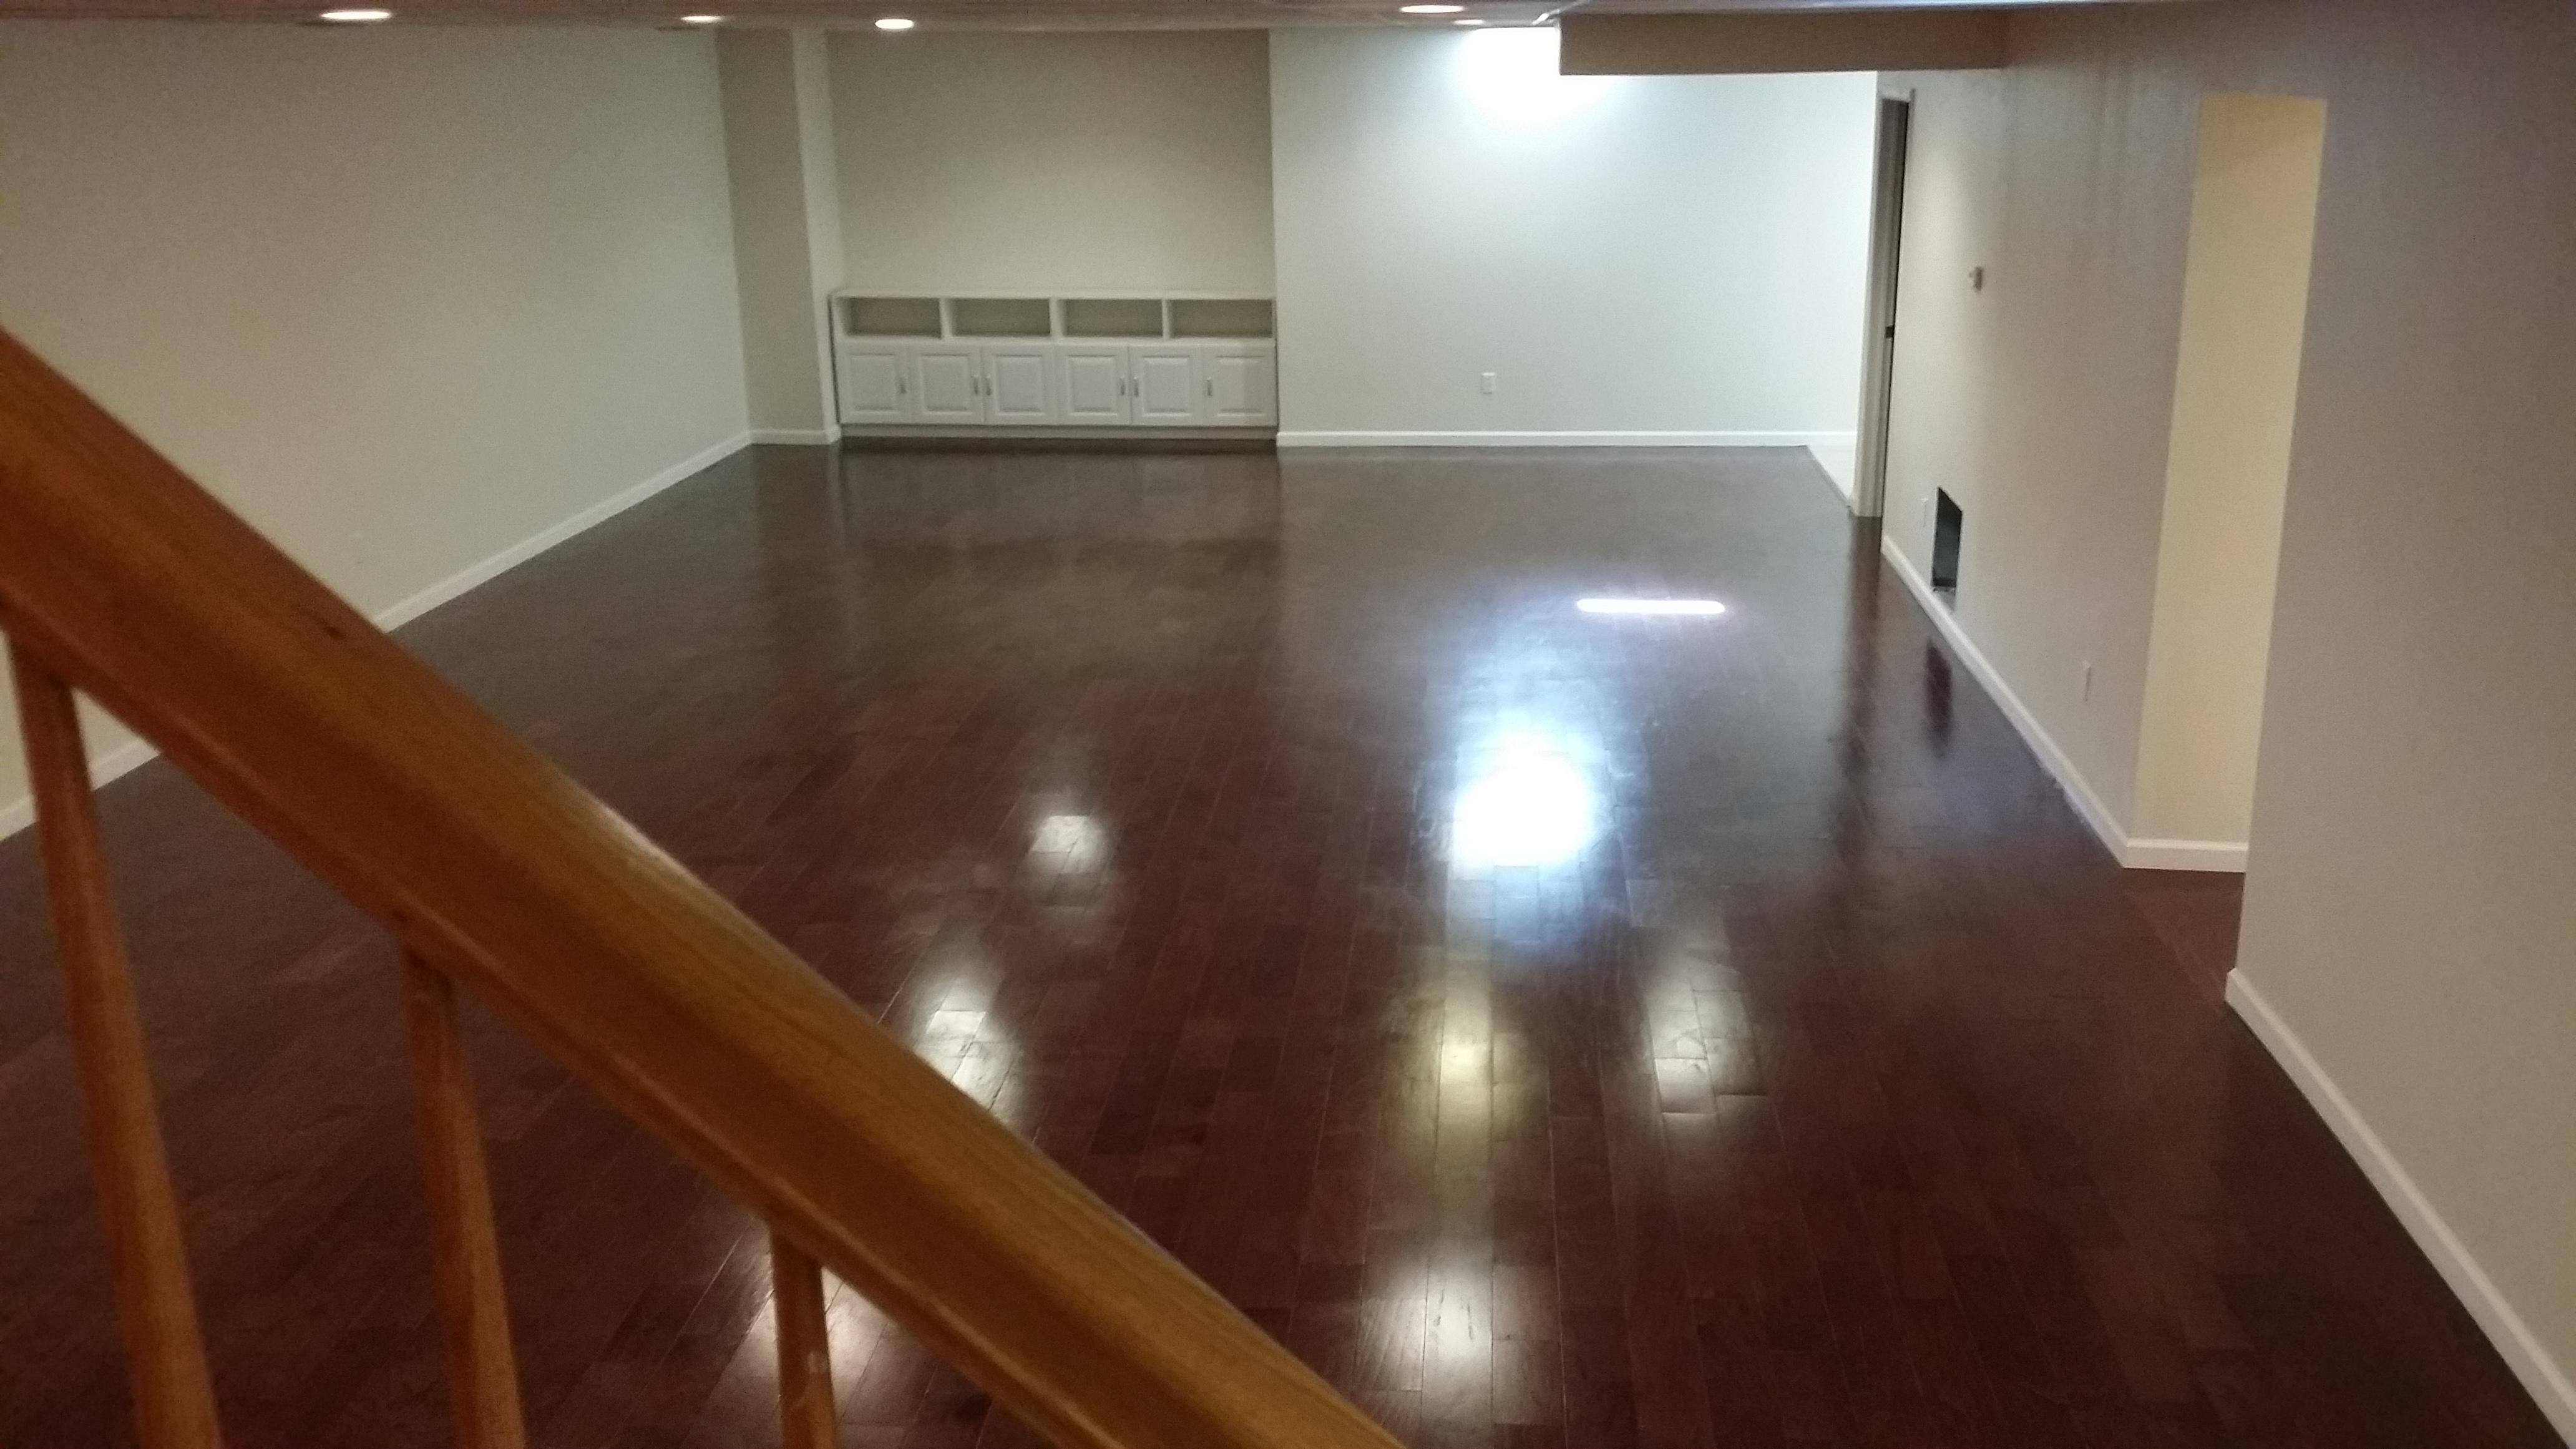 3000 Sq Ft Finished Basement Remodel Edison Nj Best Nj Home Remodeling Company